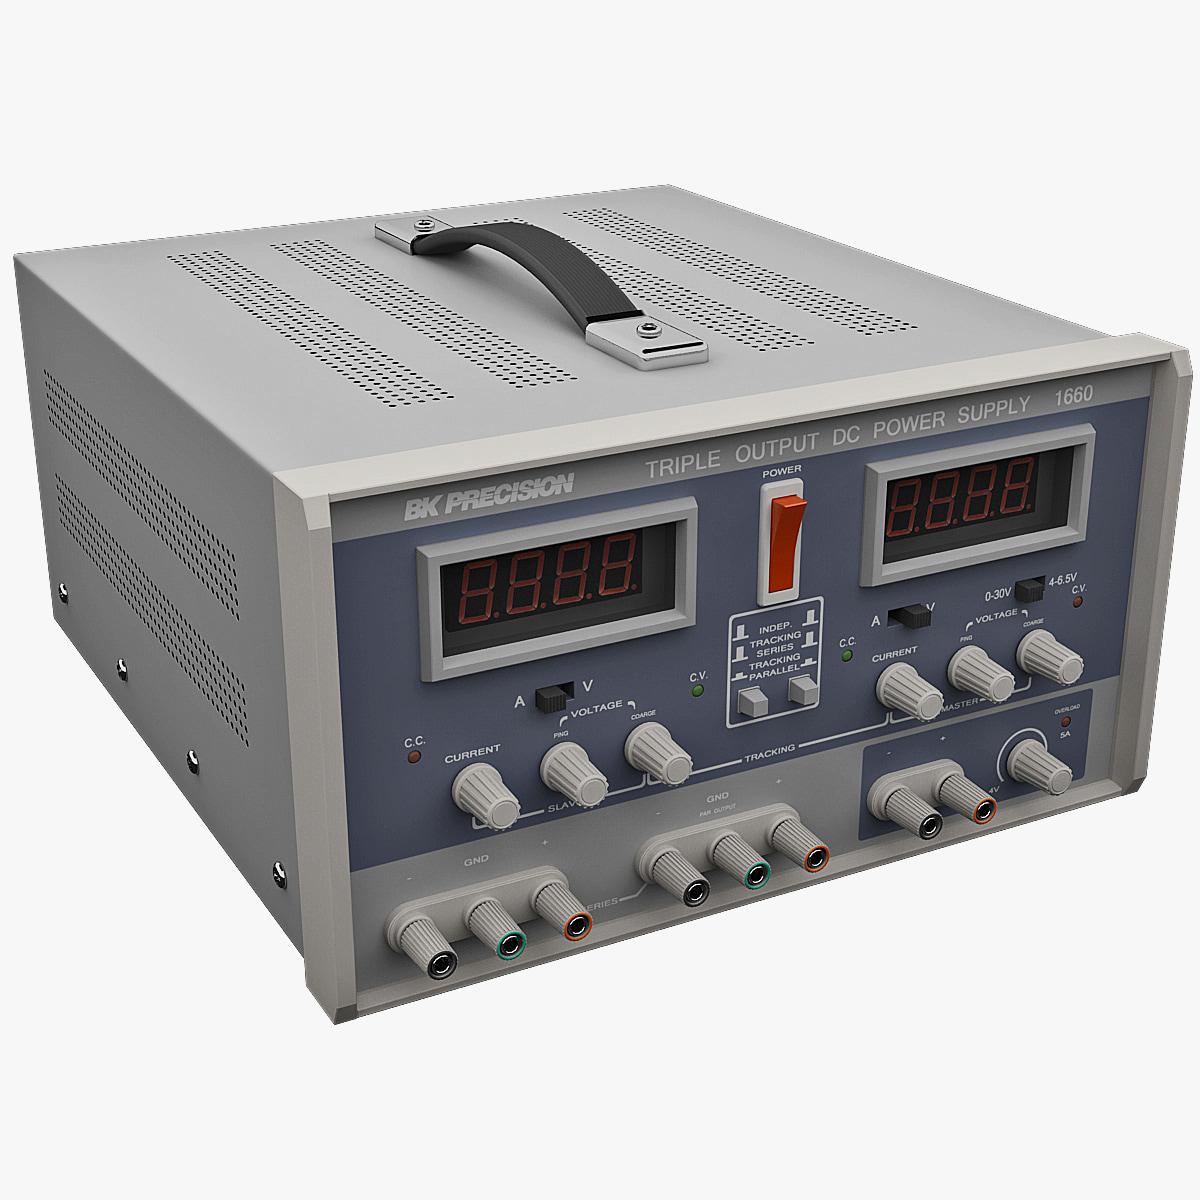 BK_Precision_1660_Power_Supply_000.jpg